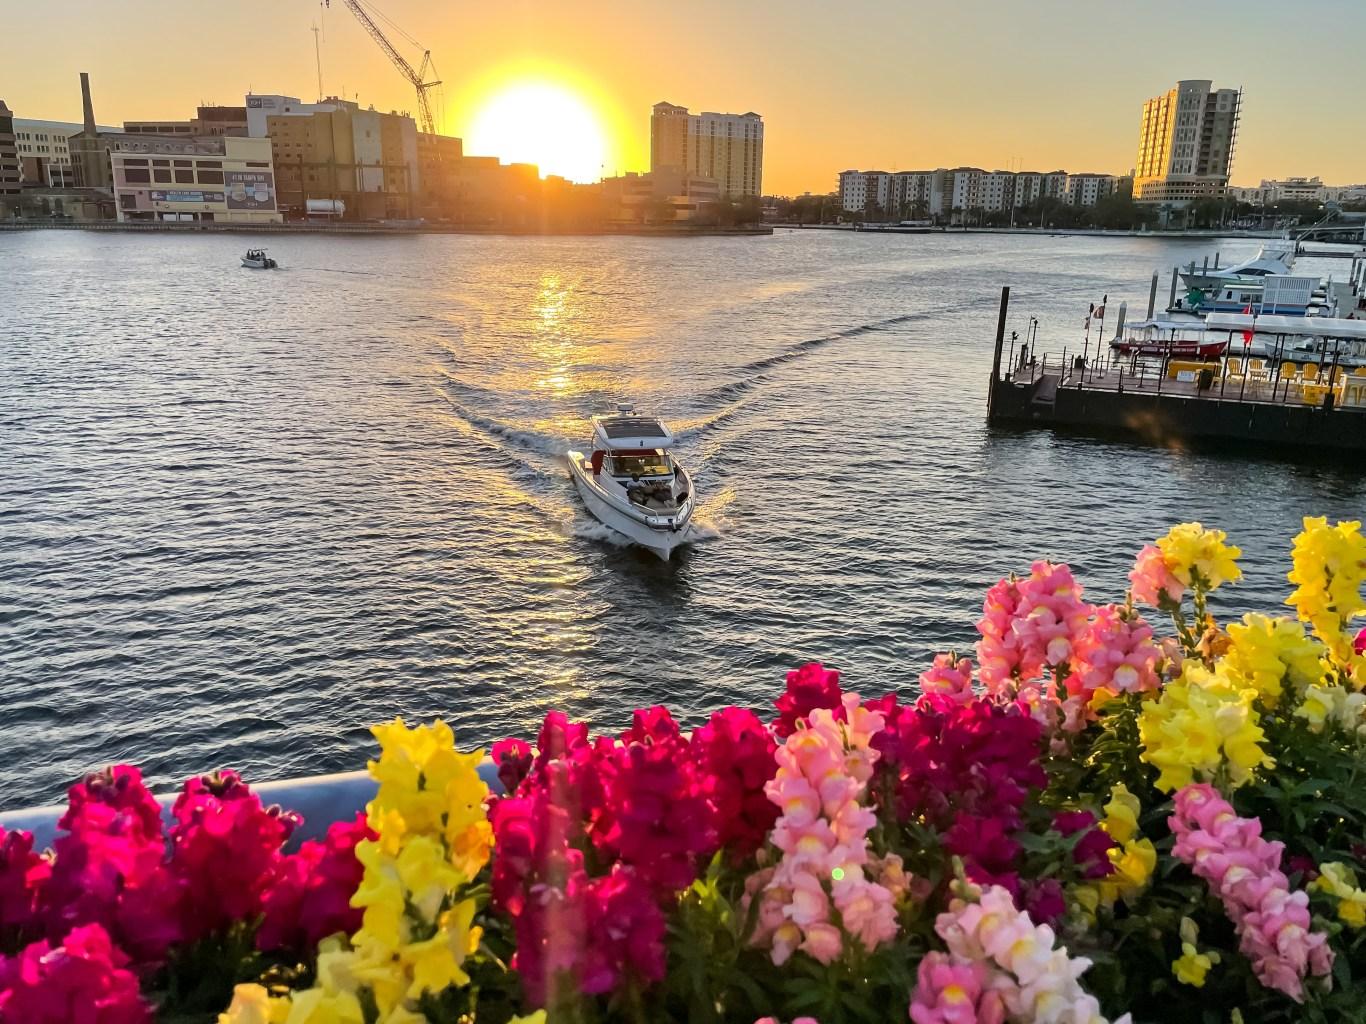 Enjoy Tampa Florida like a local